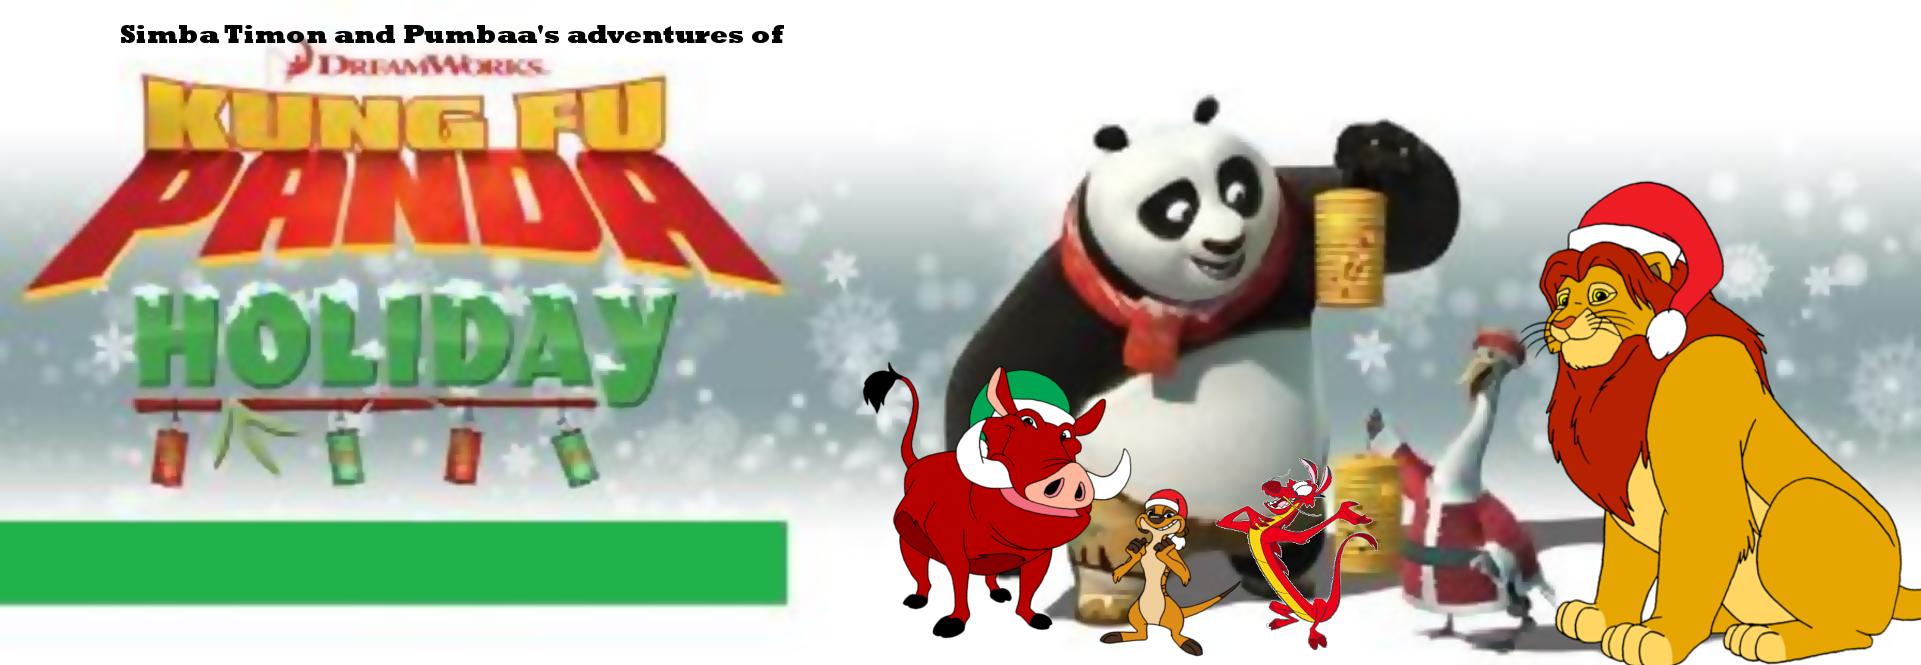 Image - Simba Timon and Pumbaa's adventures of Kung Fu Panda ...